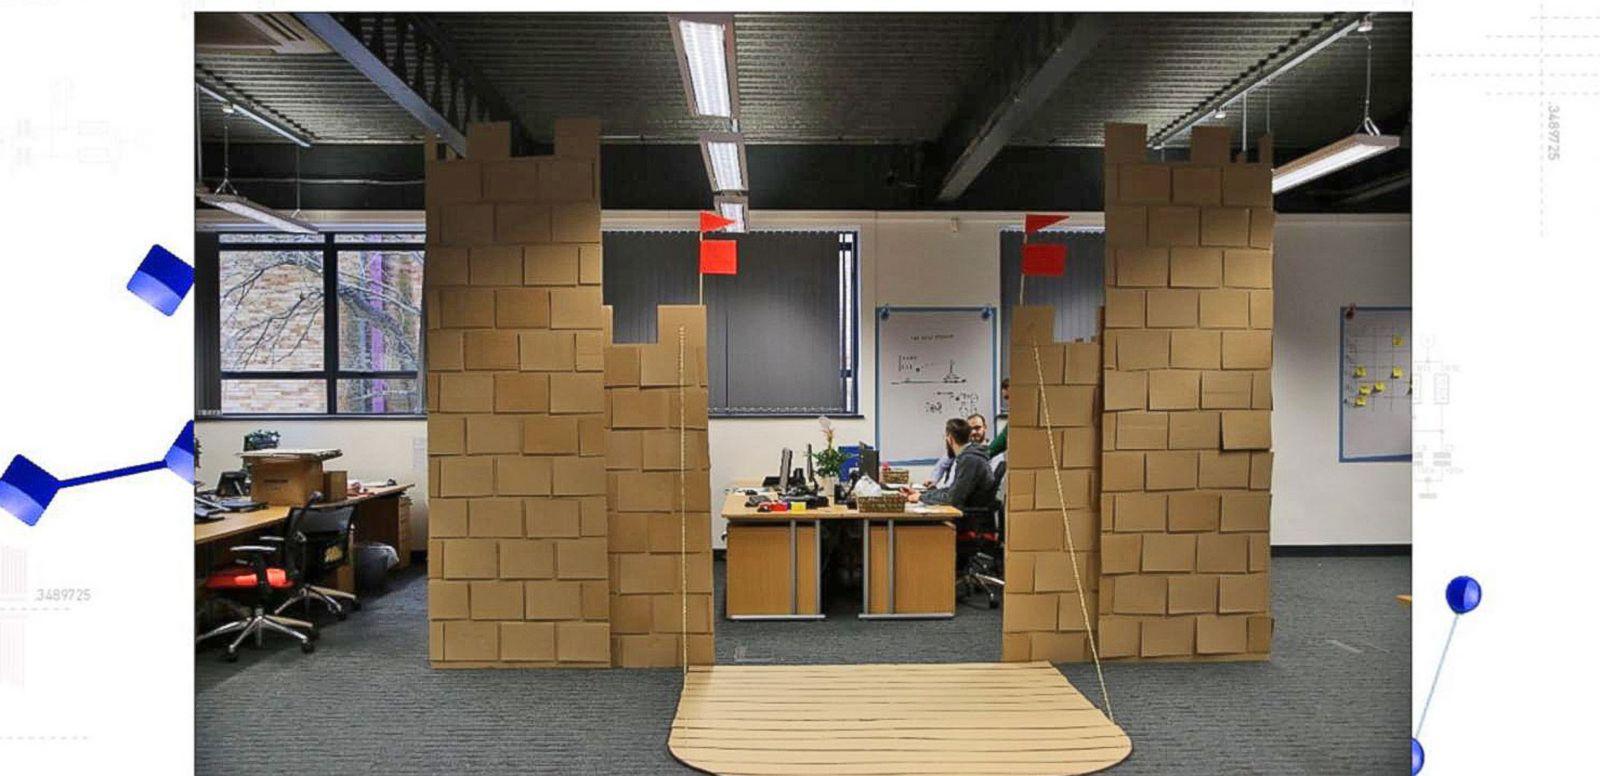 video coworkers built a 10 foot tall cardboard castle in office cardboard office